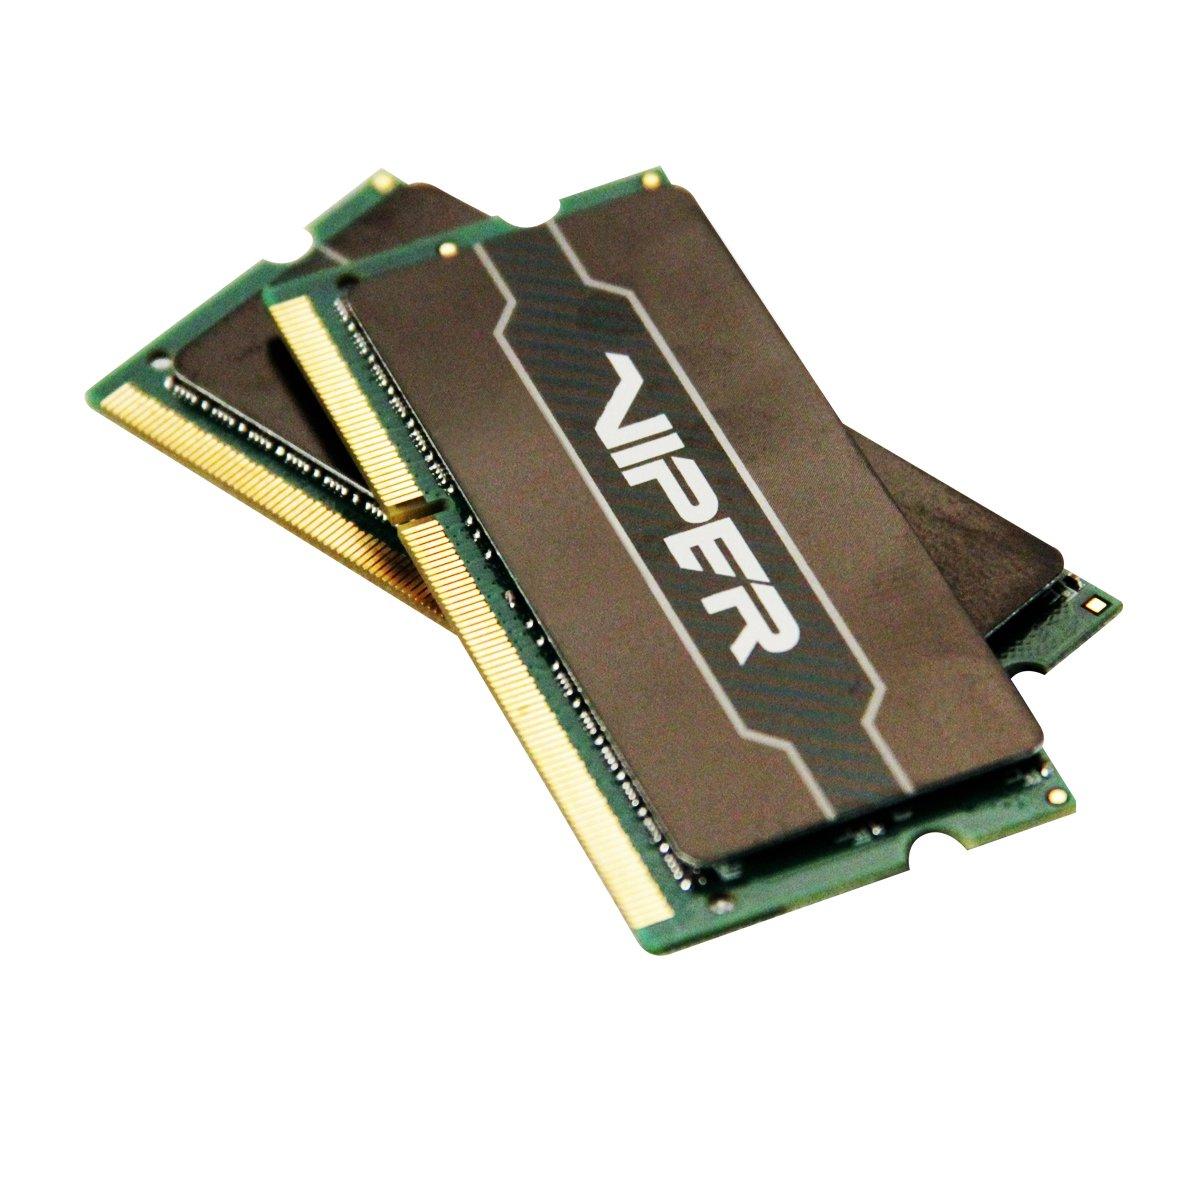 Patriot 16GB(2x8GB) Viper Series DDR3 1600 (PC3 12800) CL9/ Voltage 1.35V Laptop Memory - PV316G160LC9SK